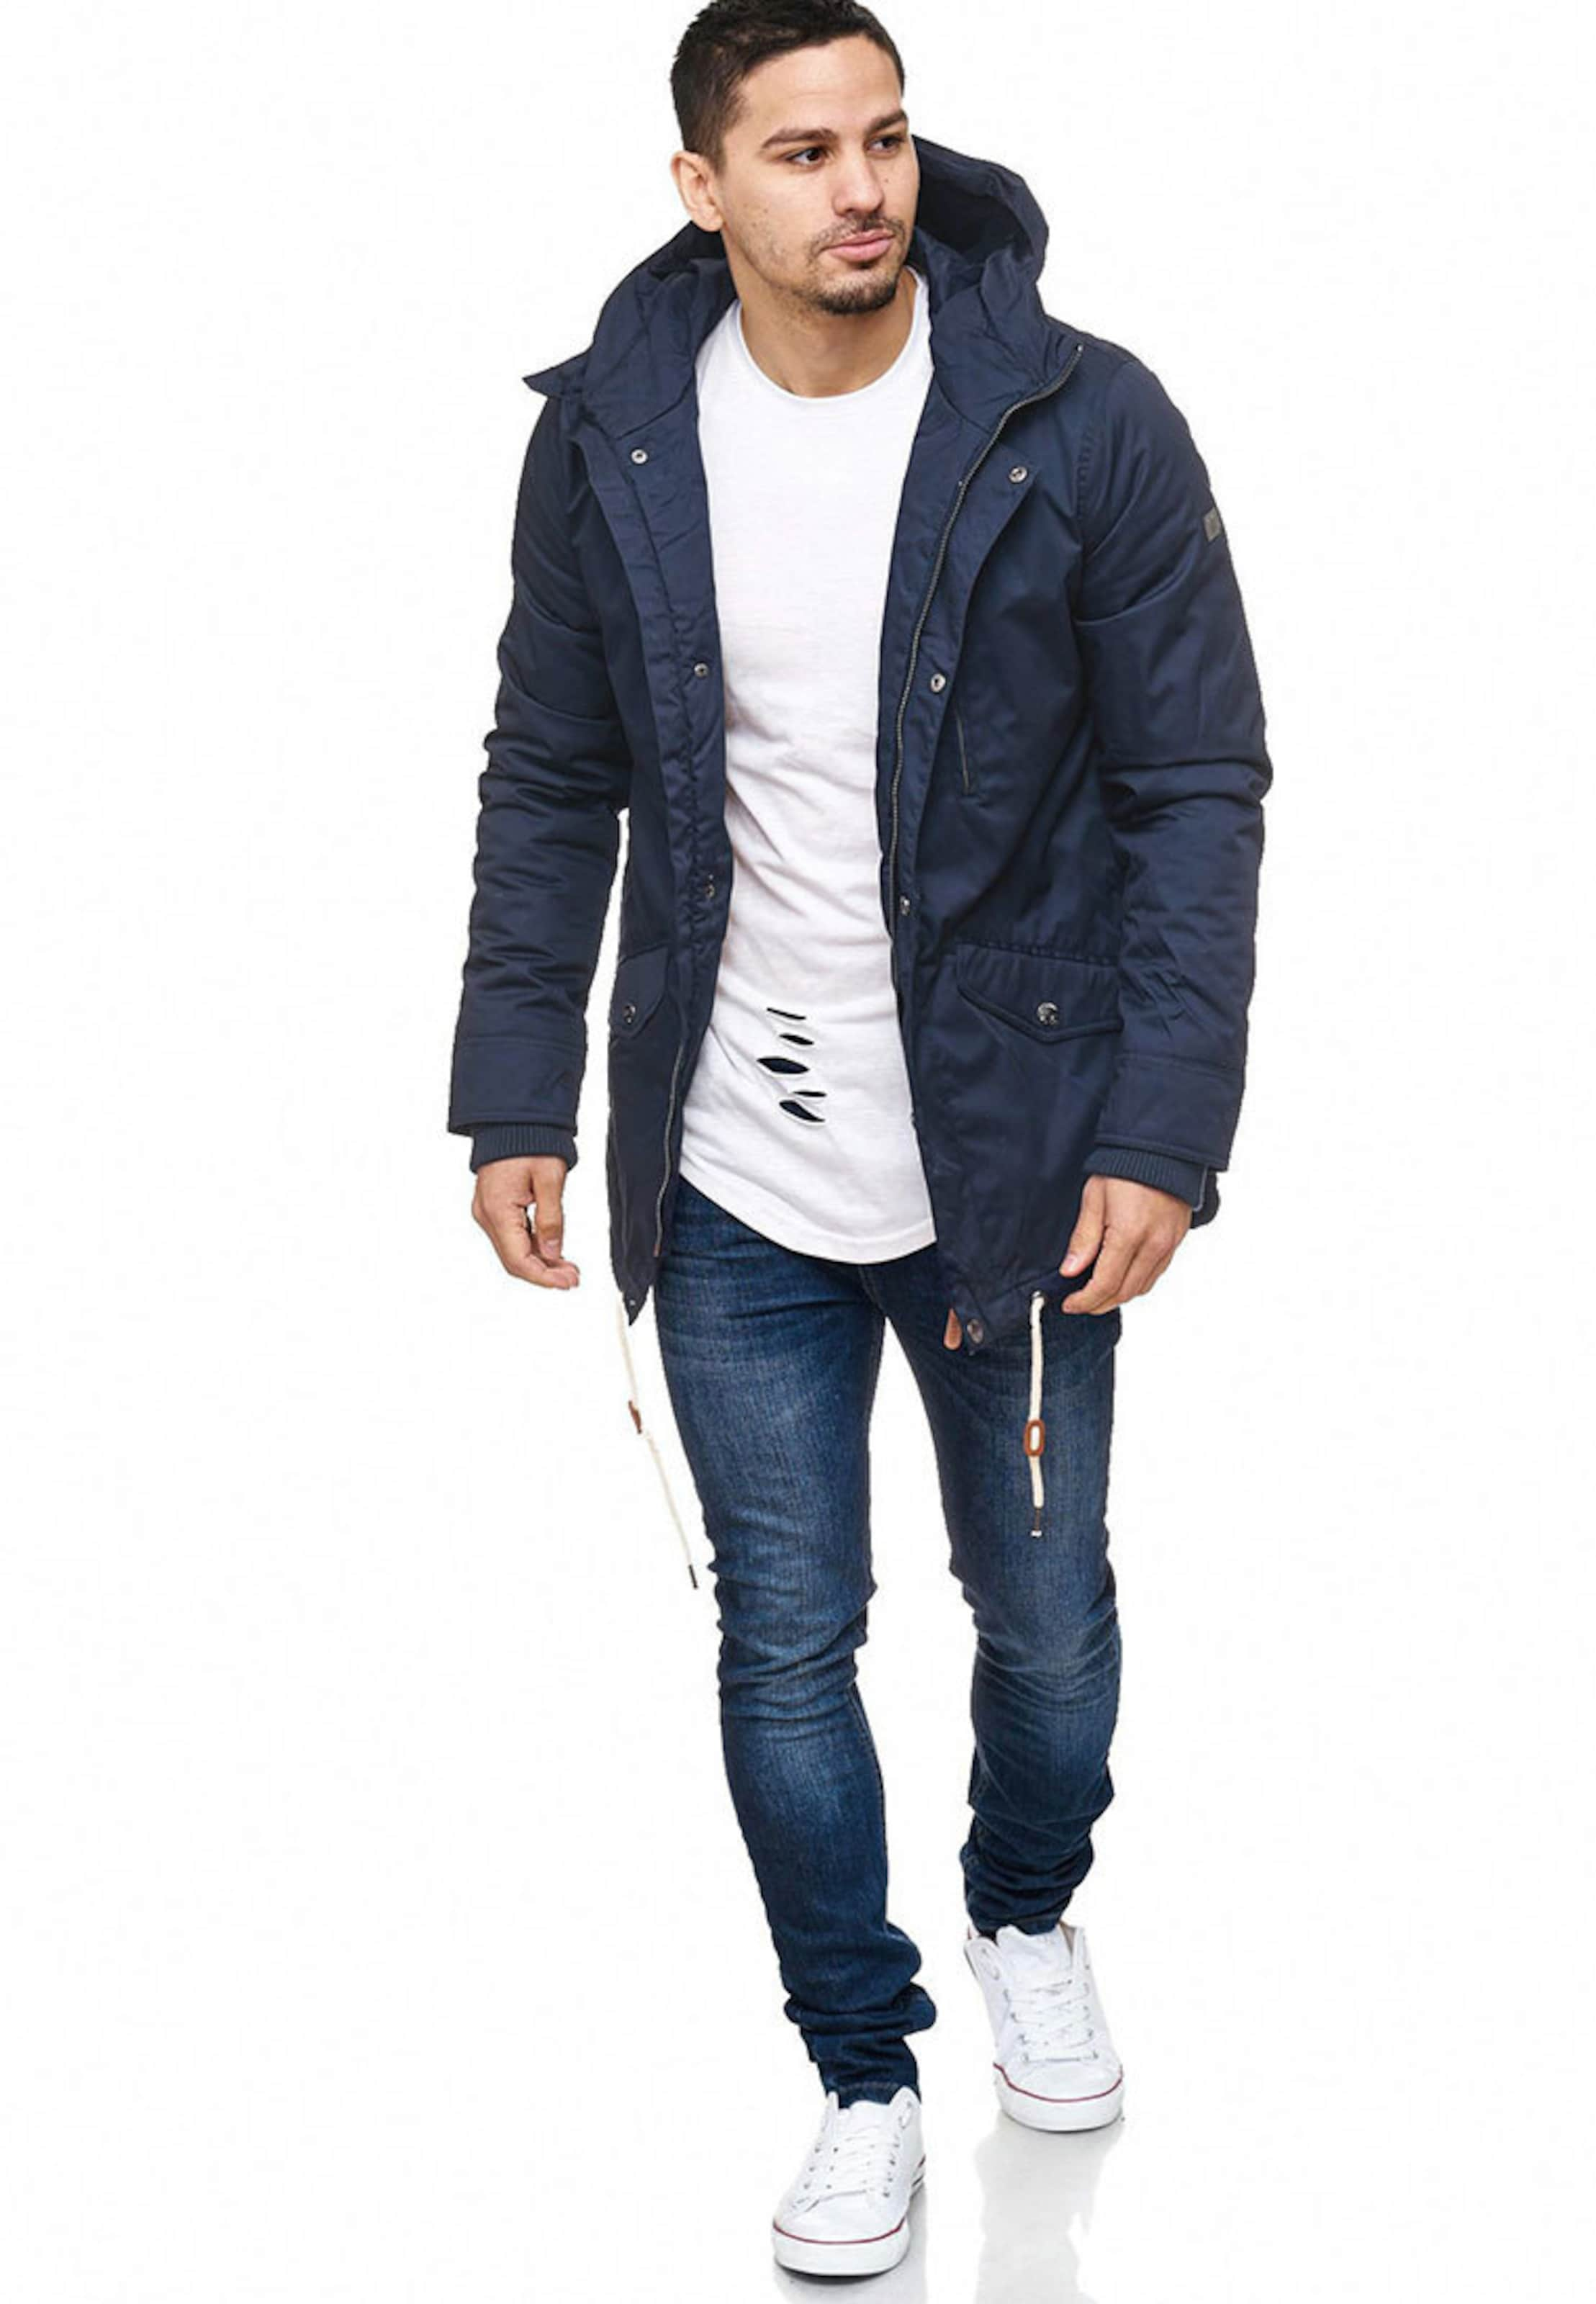 Dunkelblau Parka Jeans Chance In Indicode ' T3FK15lJcu